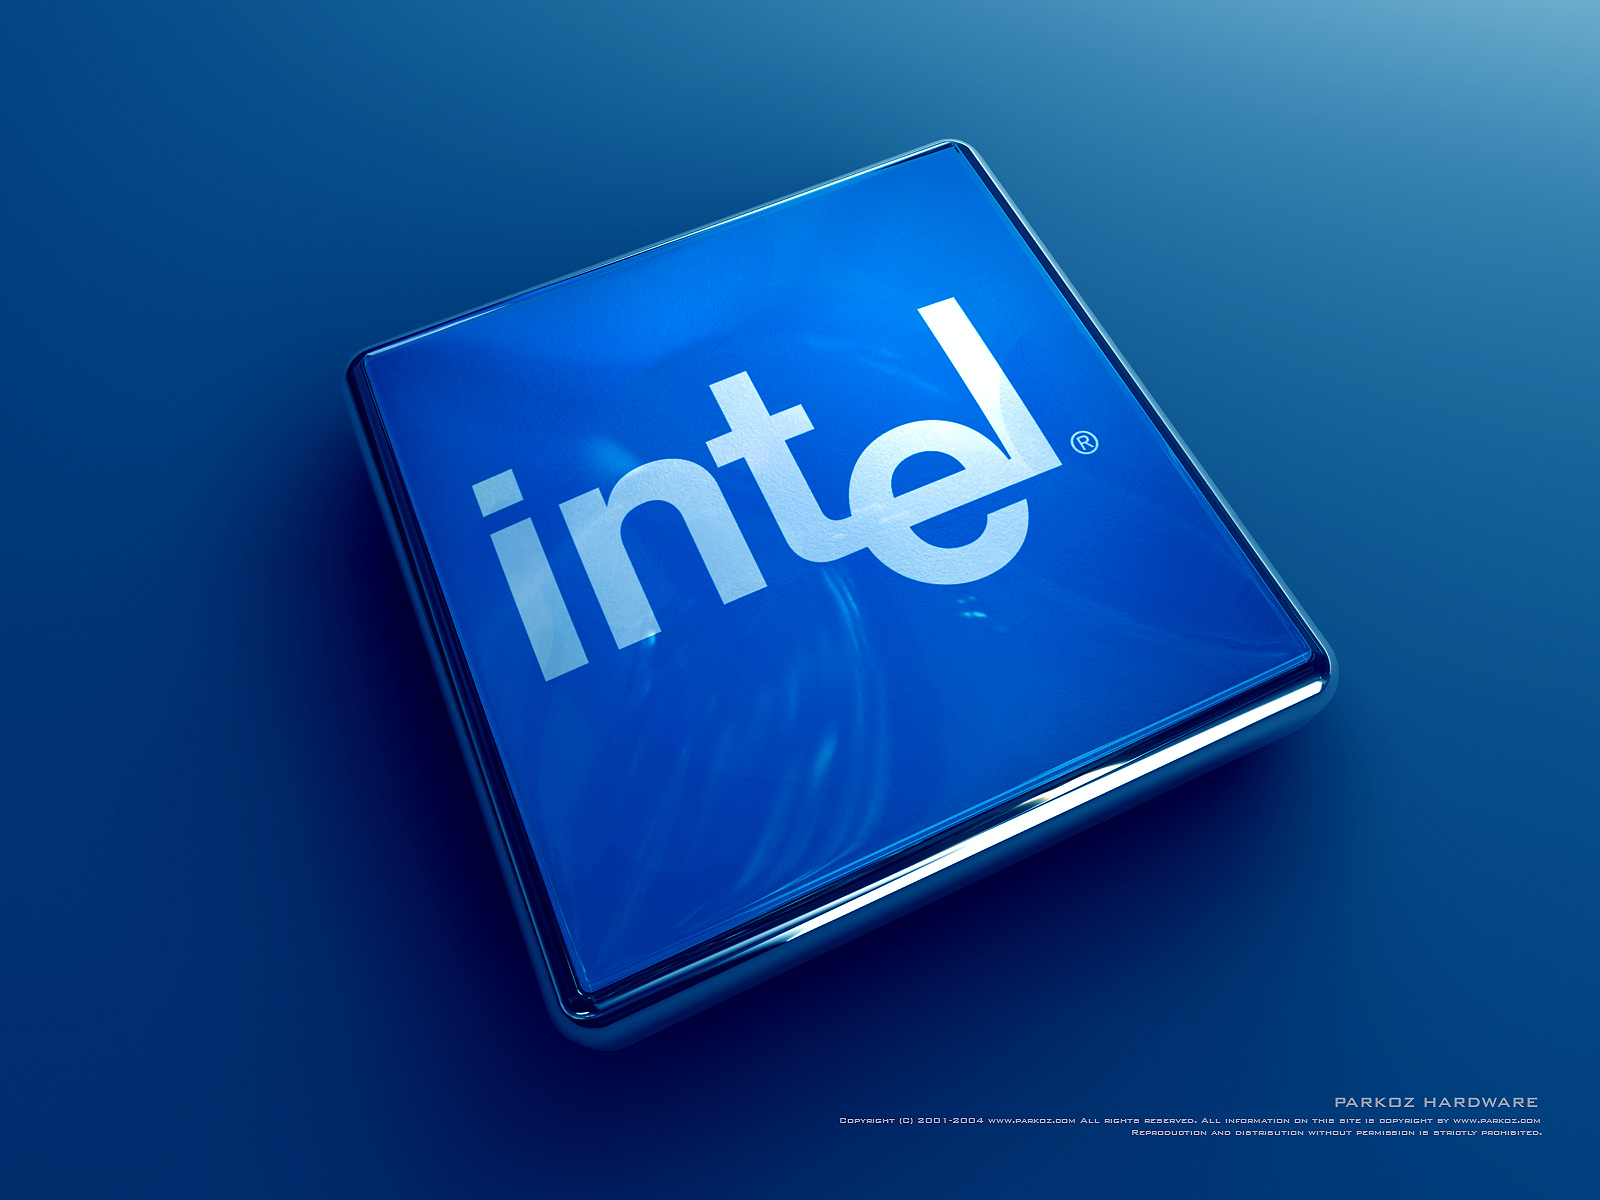 Intel I5 Logo Intel Logo Png 1600x1200